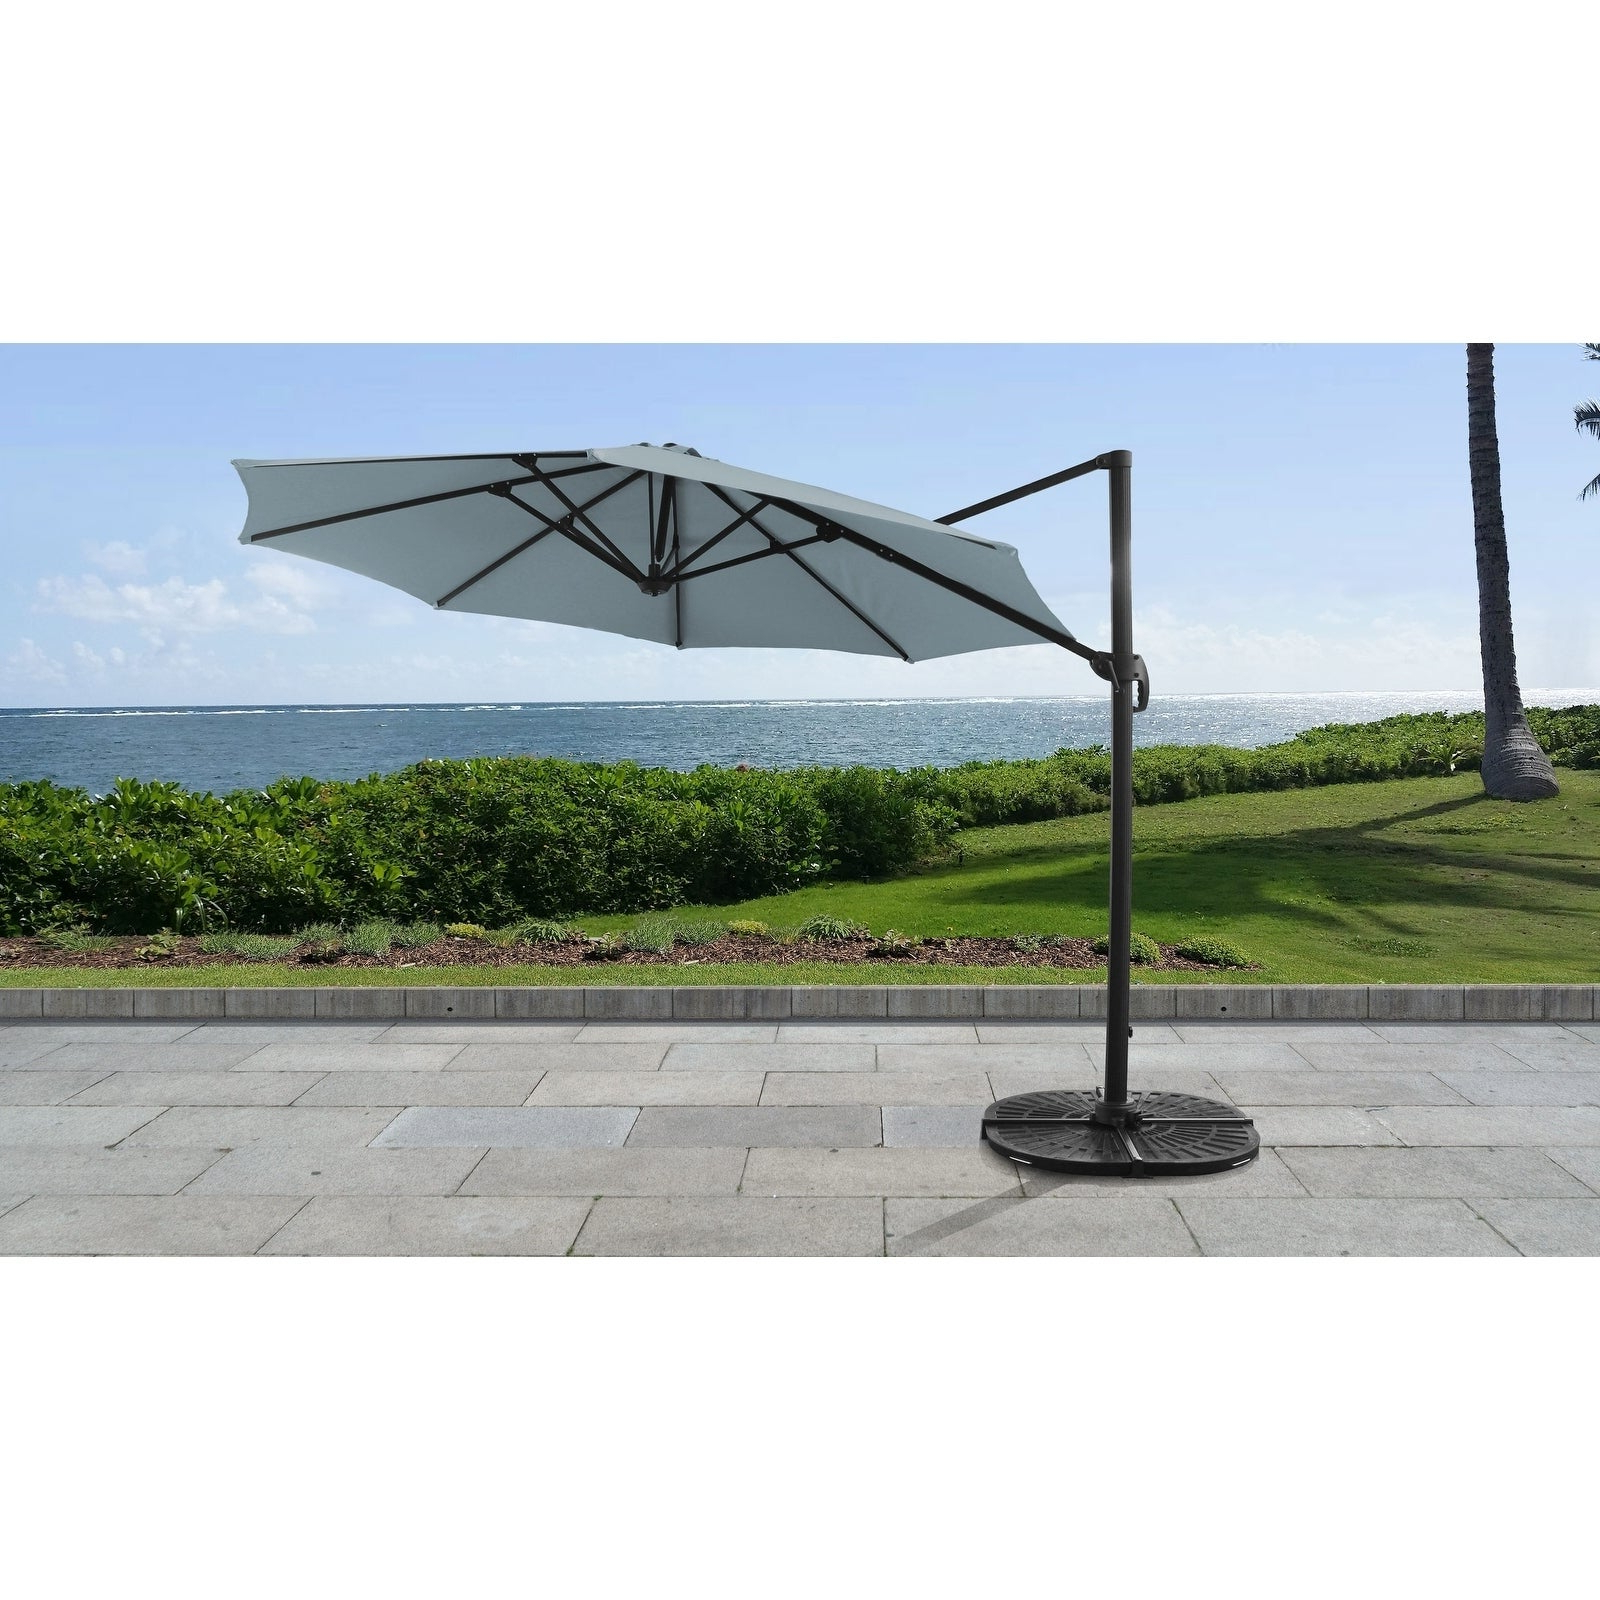 Cantilever Umbrellas In Popular 11' Outdoor Cantilever Umbrella (View 7 of 20)